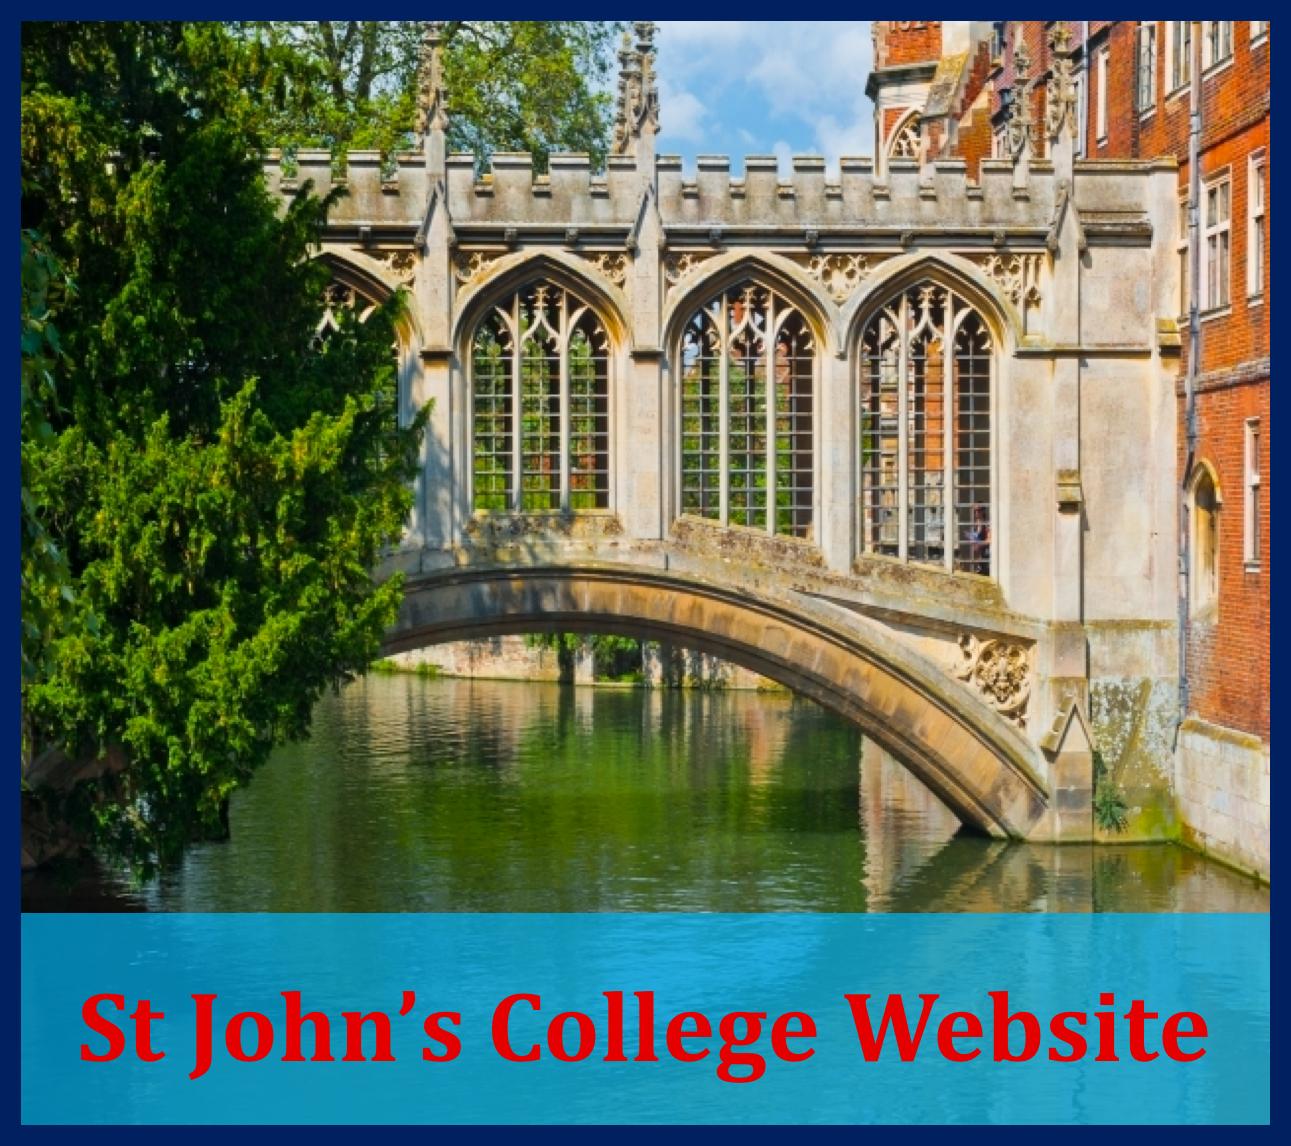 st johns website